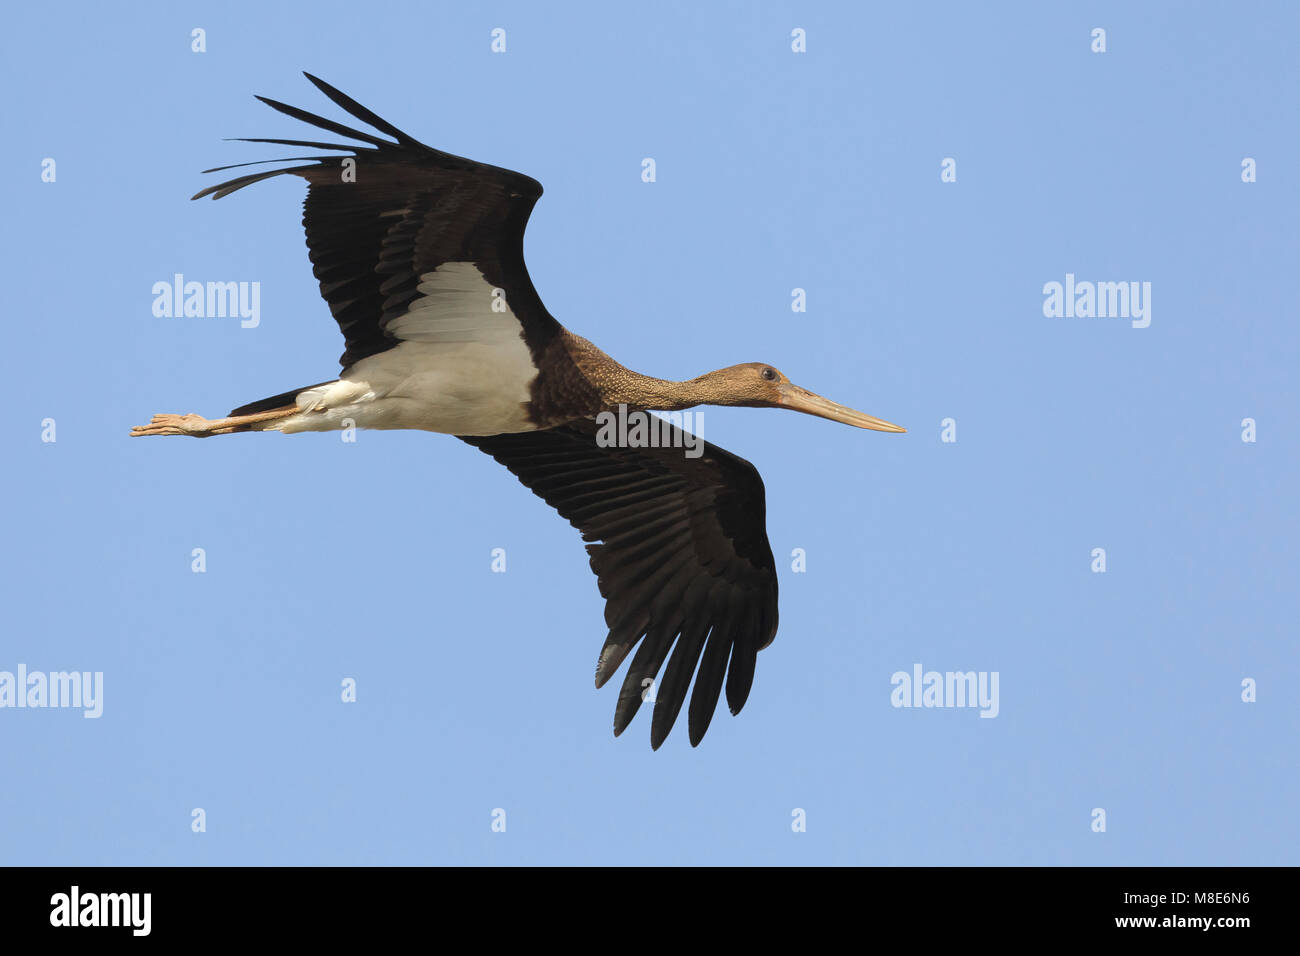 Juveniele Zwarte Ooievaar in de vlucht; Juvenile Black Stork in flight Stock Photo